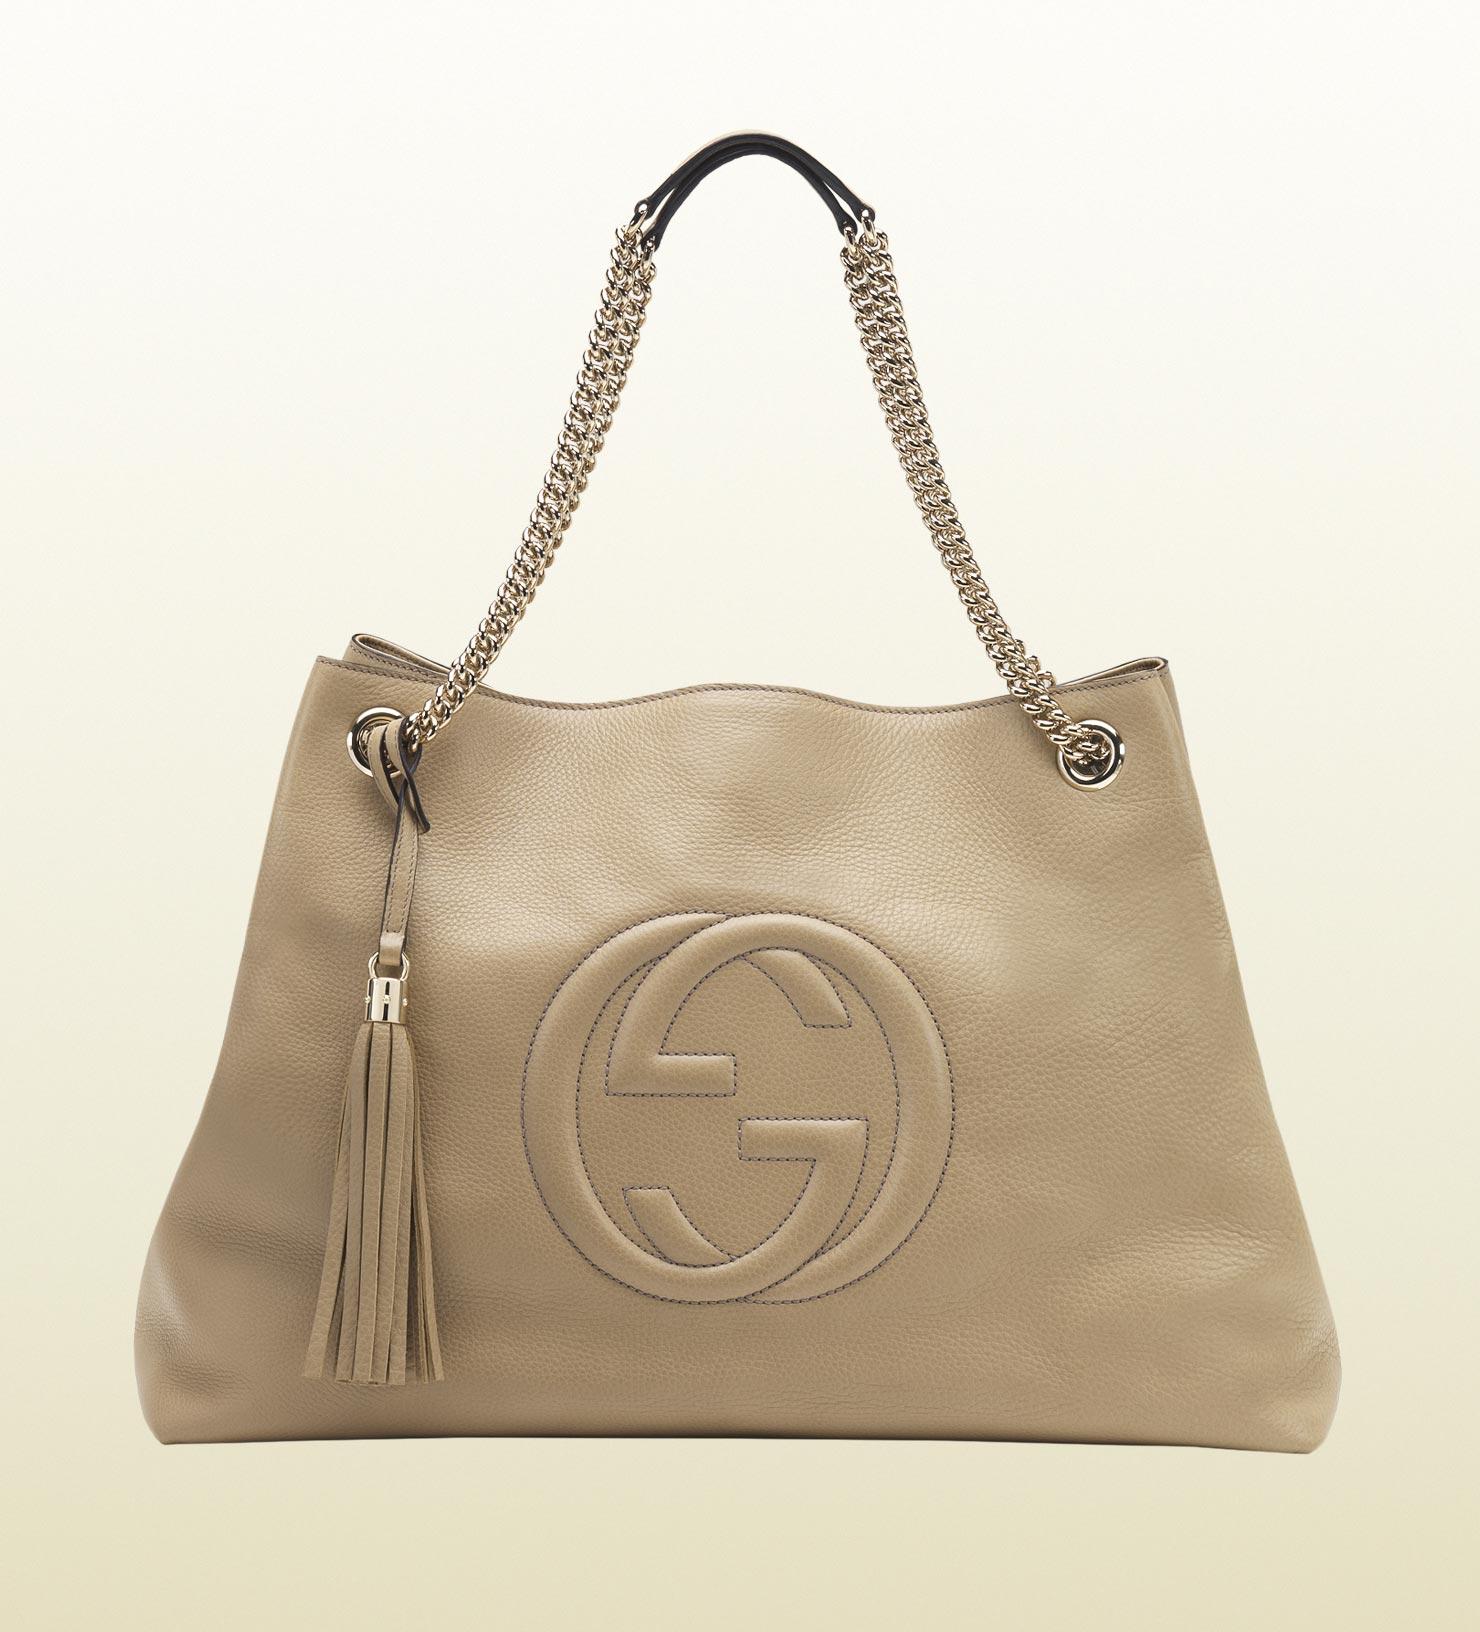 Gucci Soho Leather Shoulder Bag in Natural | Lyst